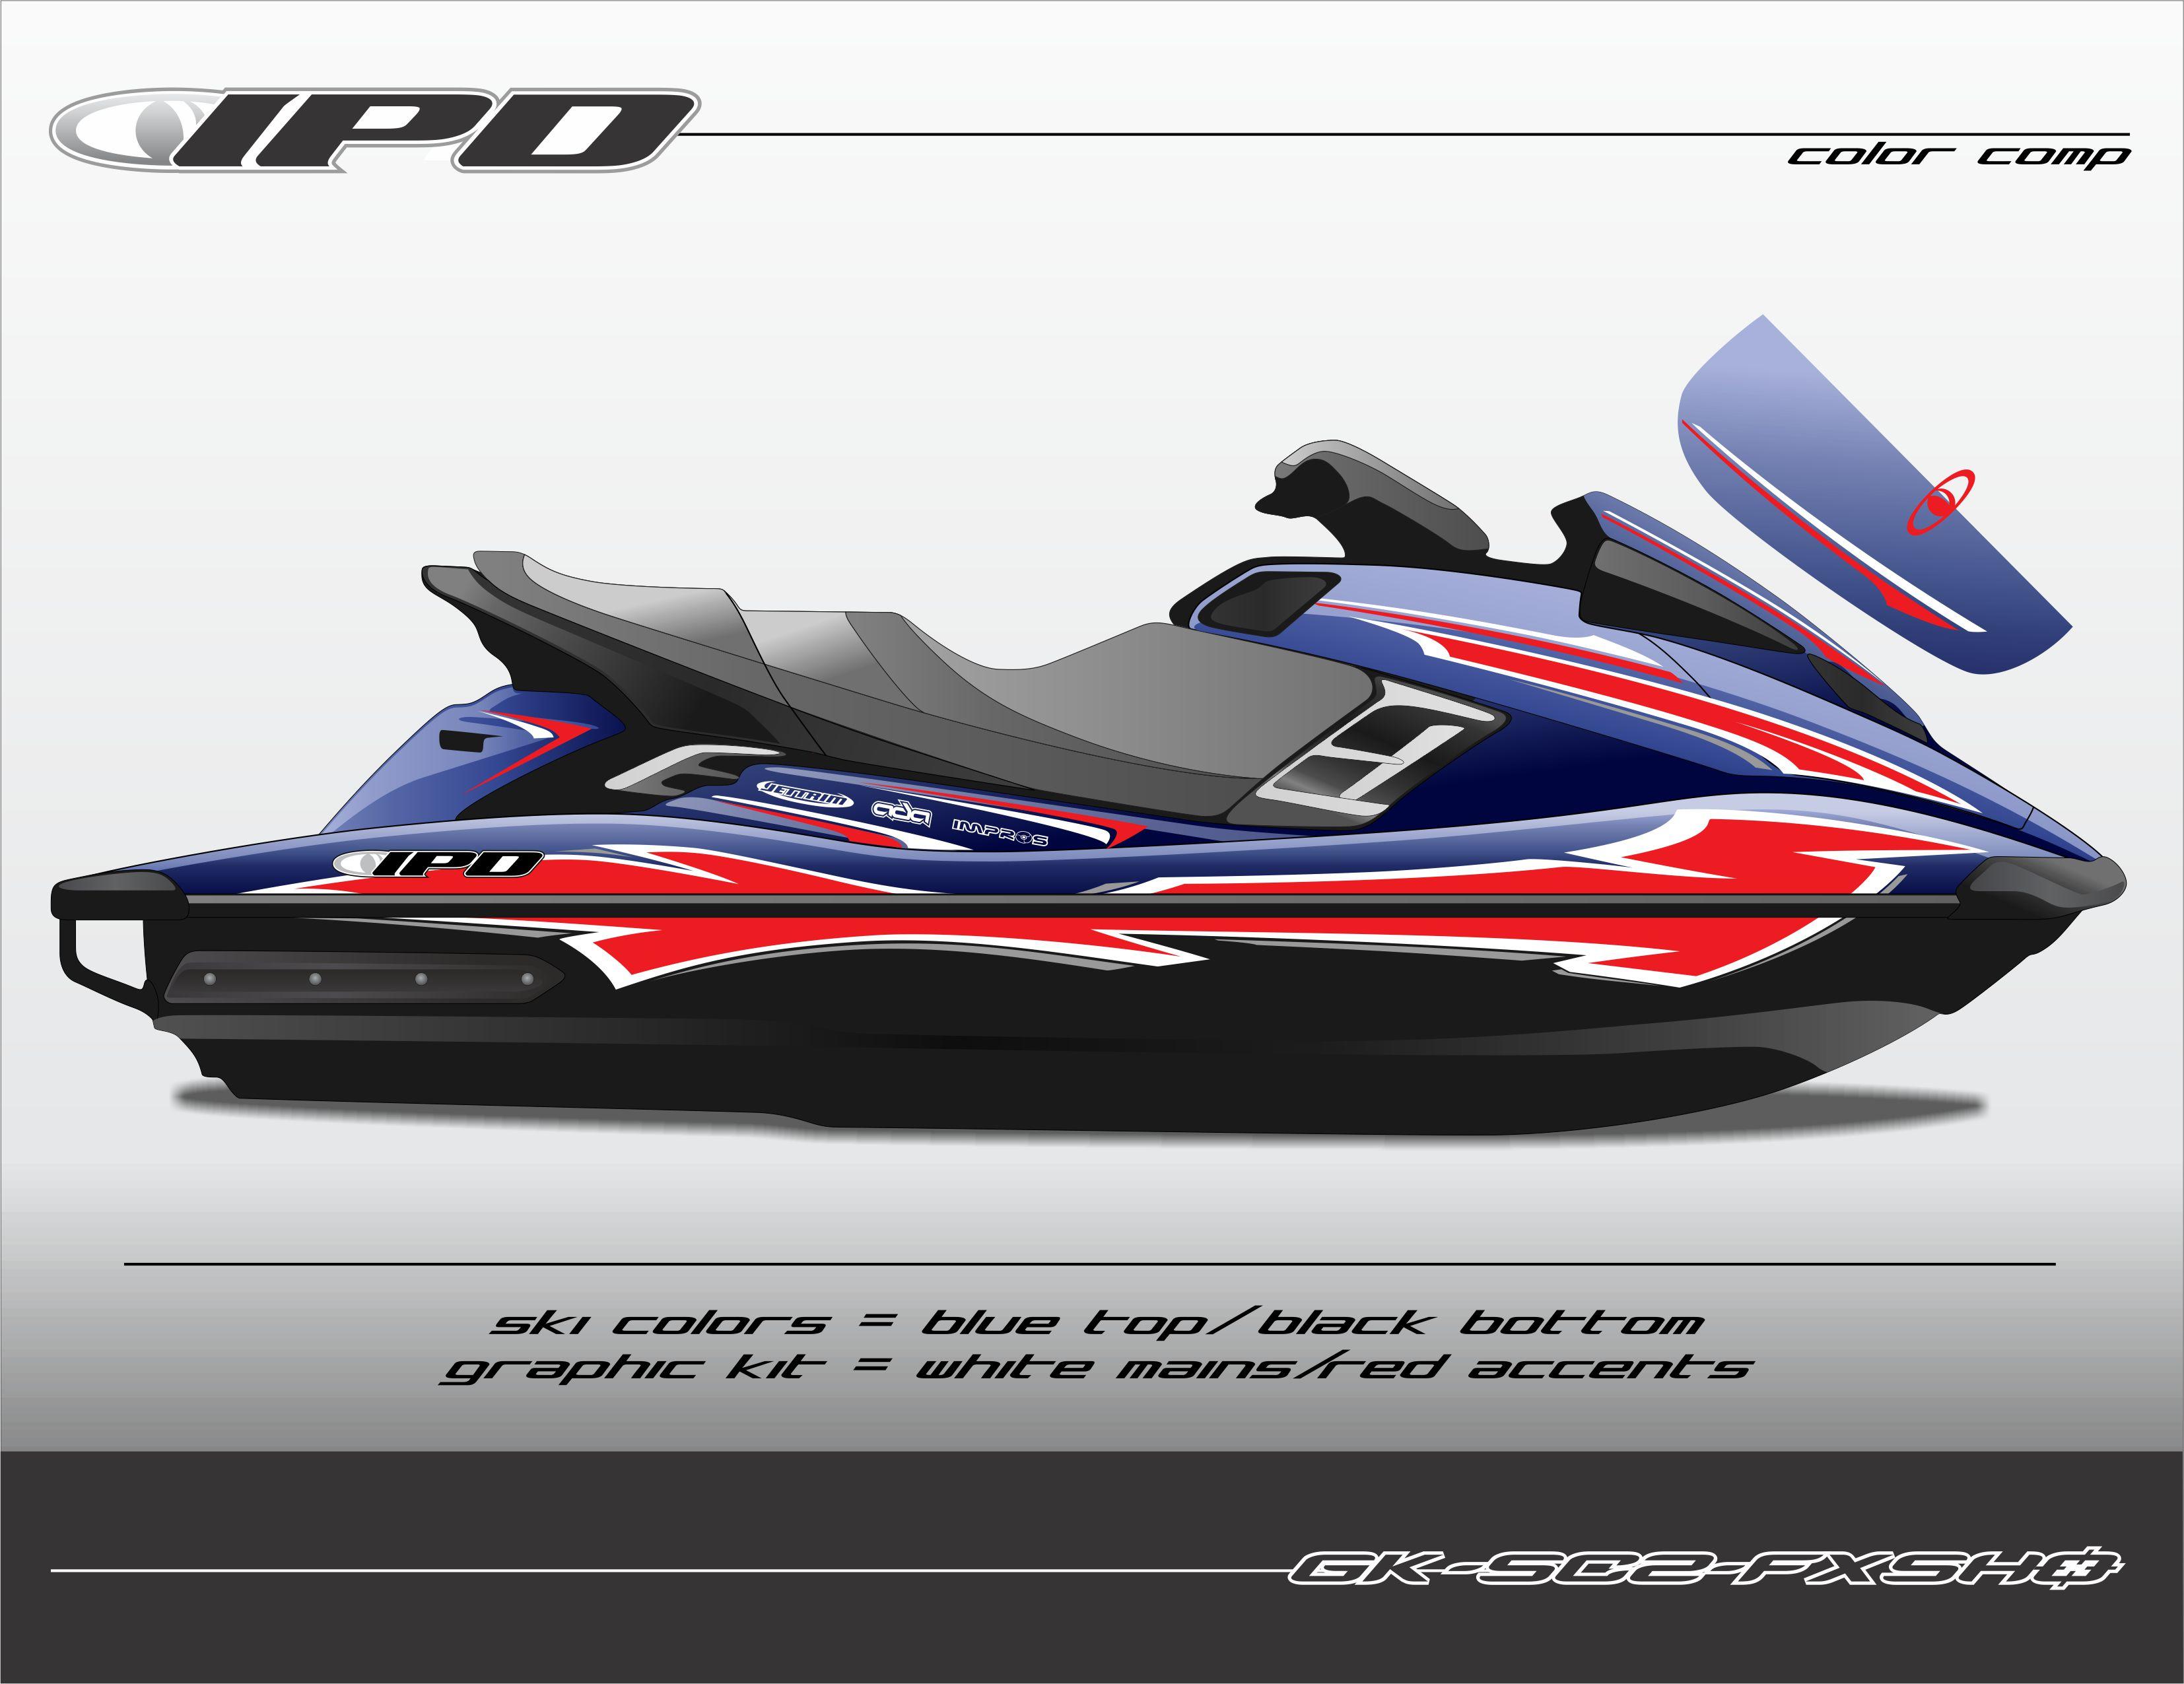 Yamaha gen 2 fxho fxsho fxsvho graphics kit sc2 design for Jet ski prices yamaha